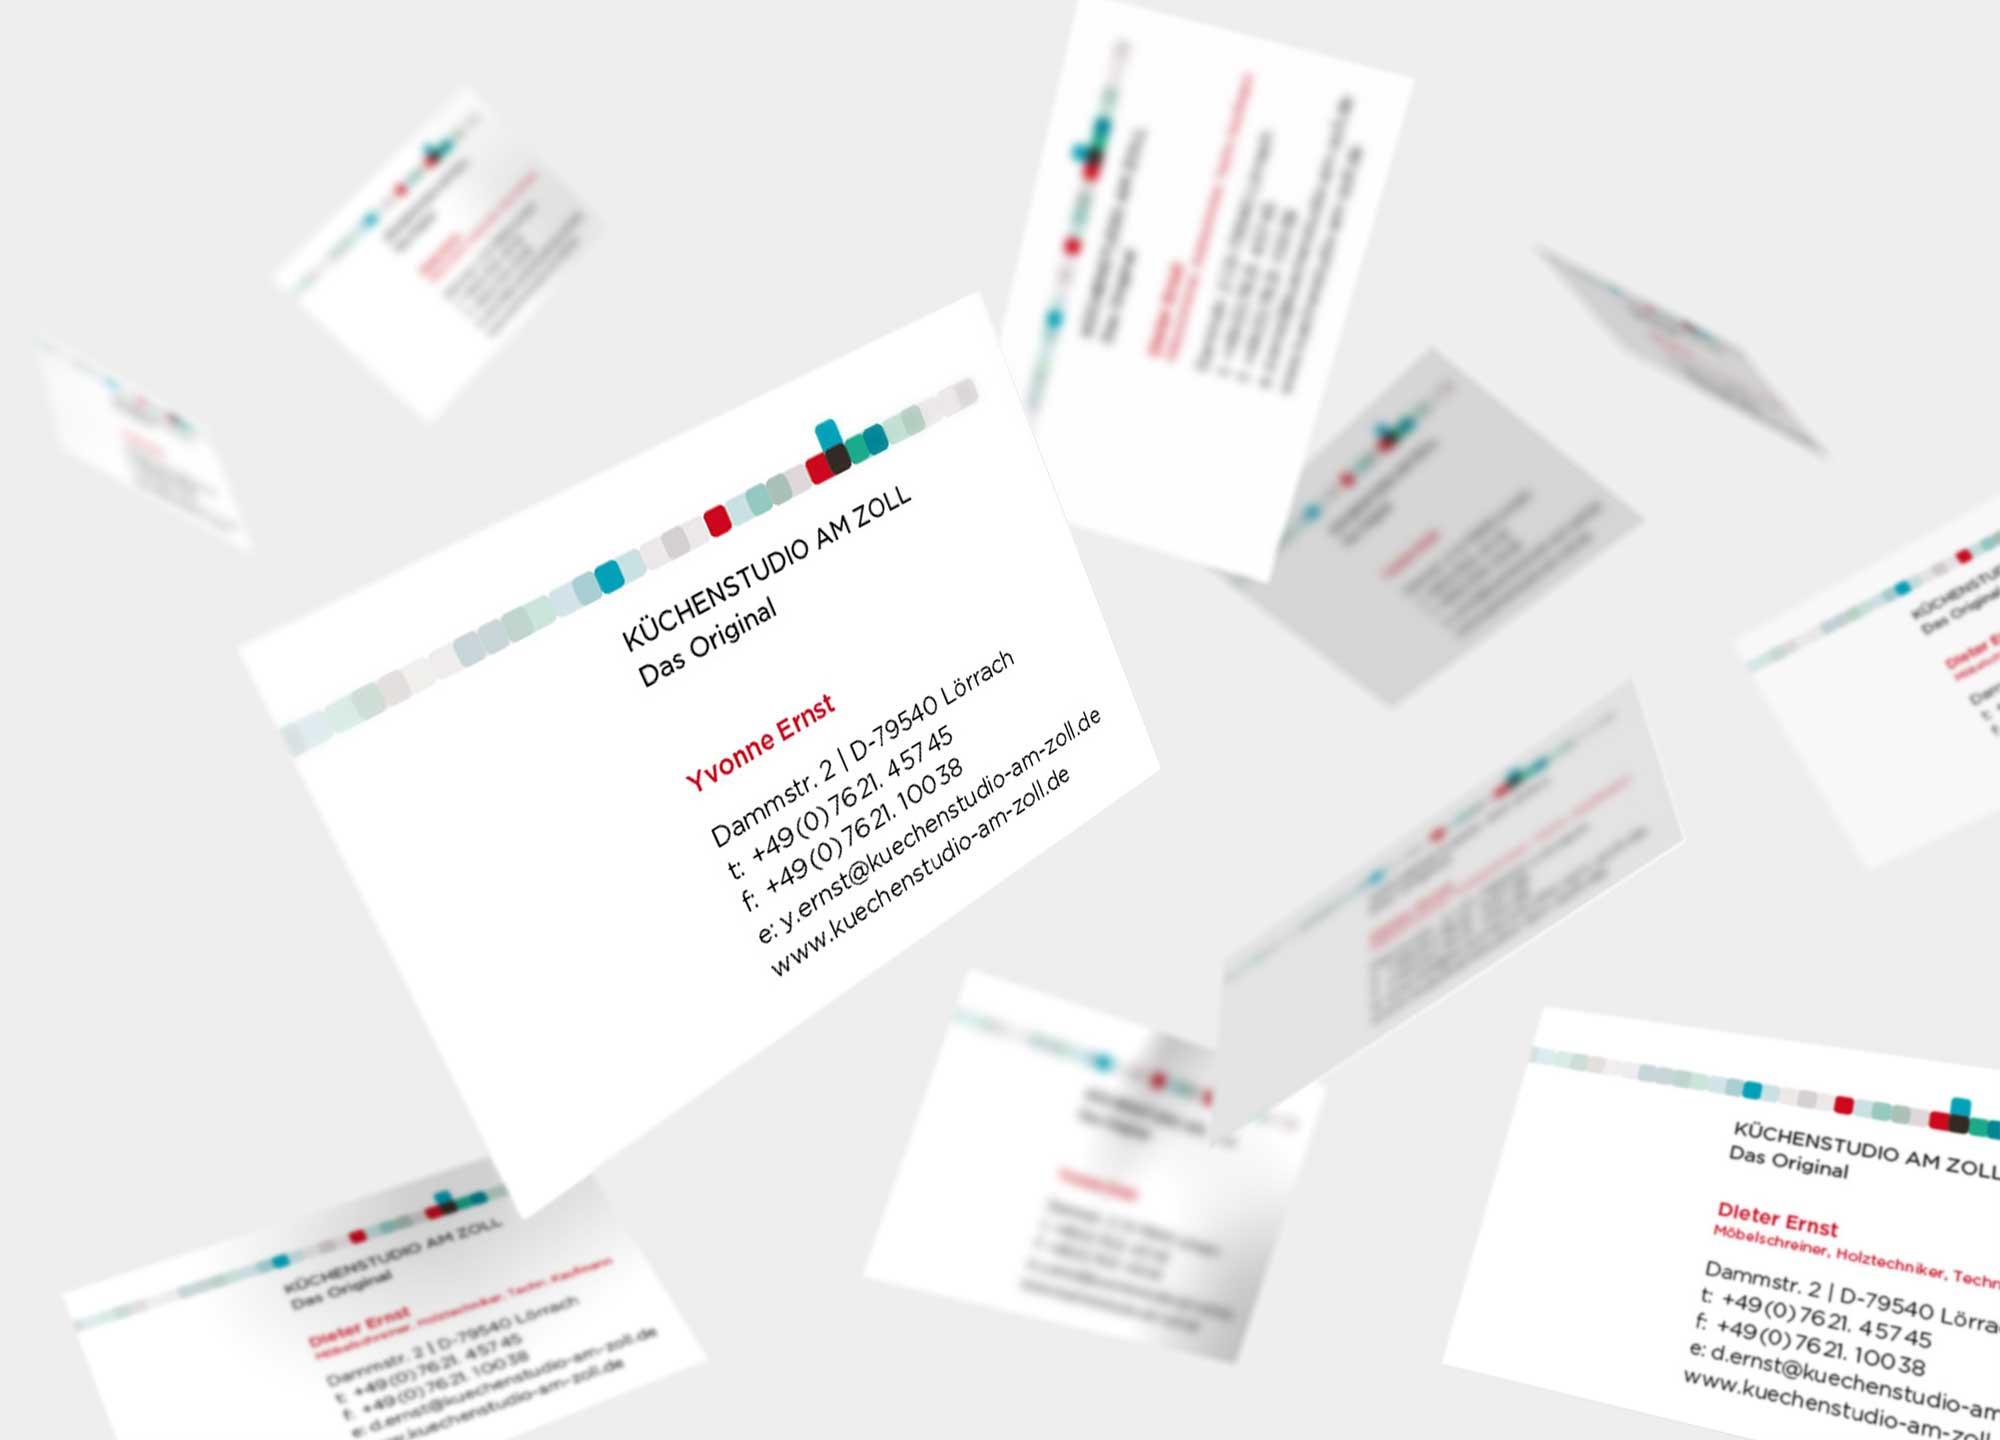 Kuechstudio_Visitenkarte_Simulation_Web